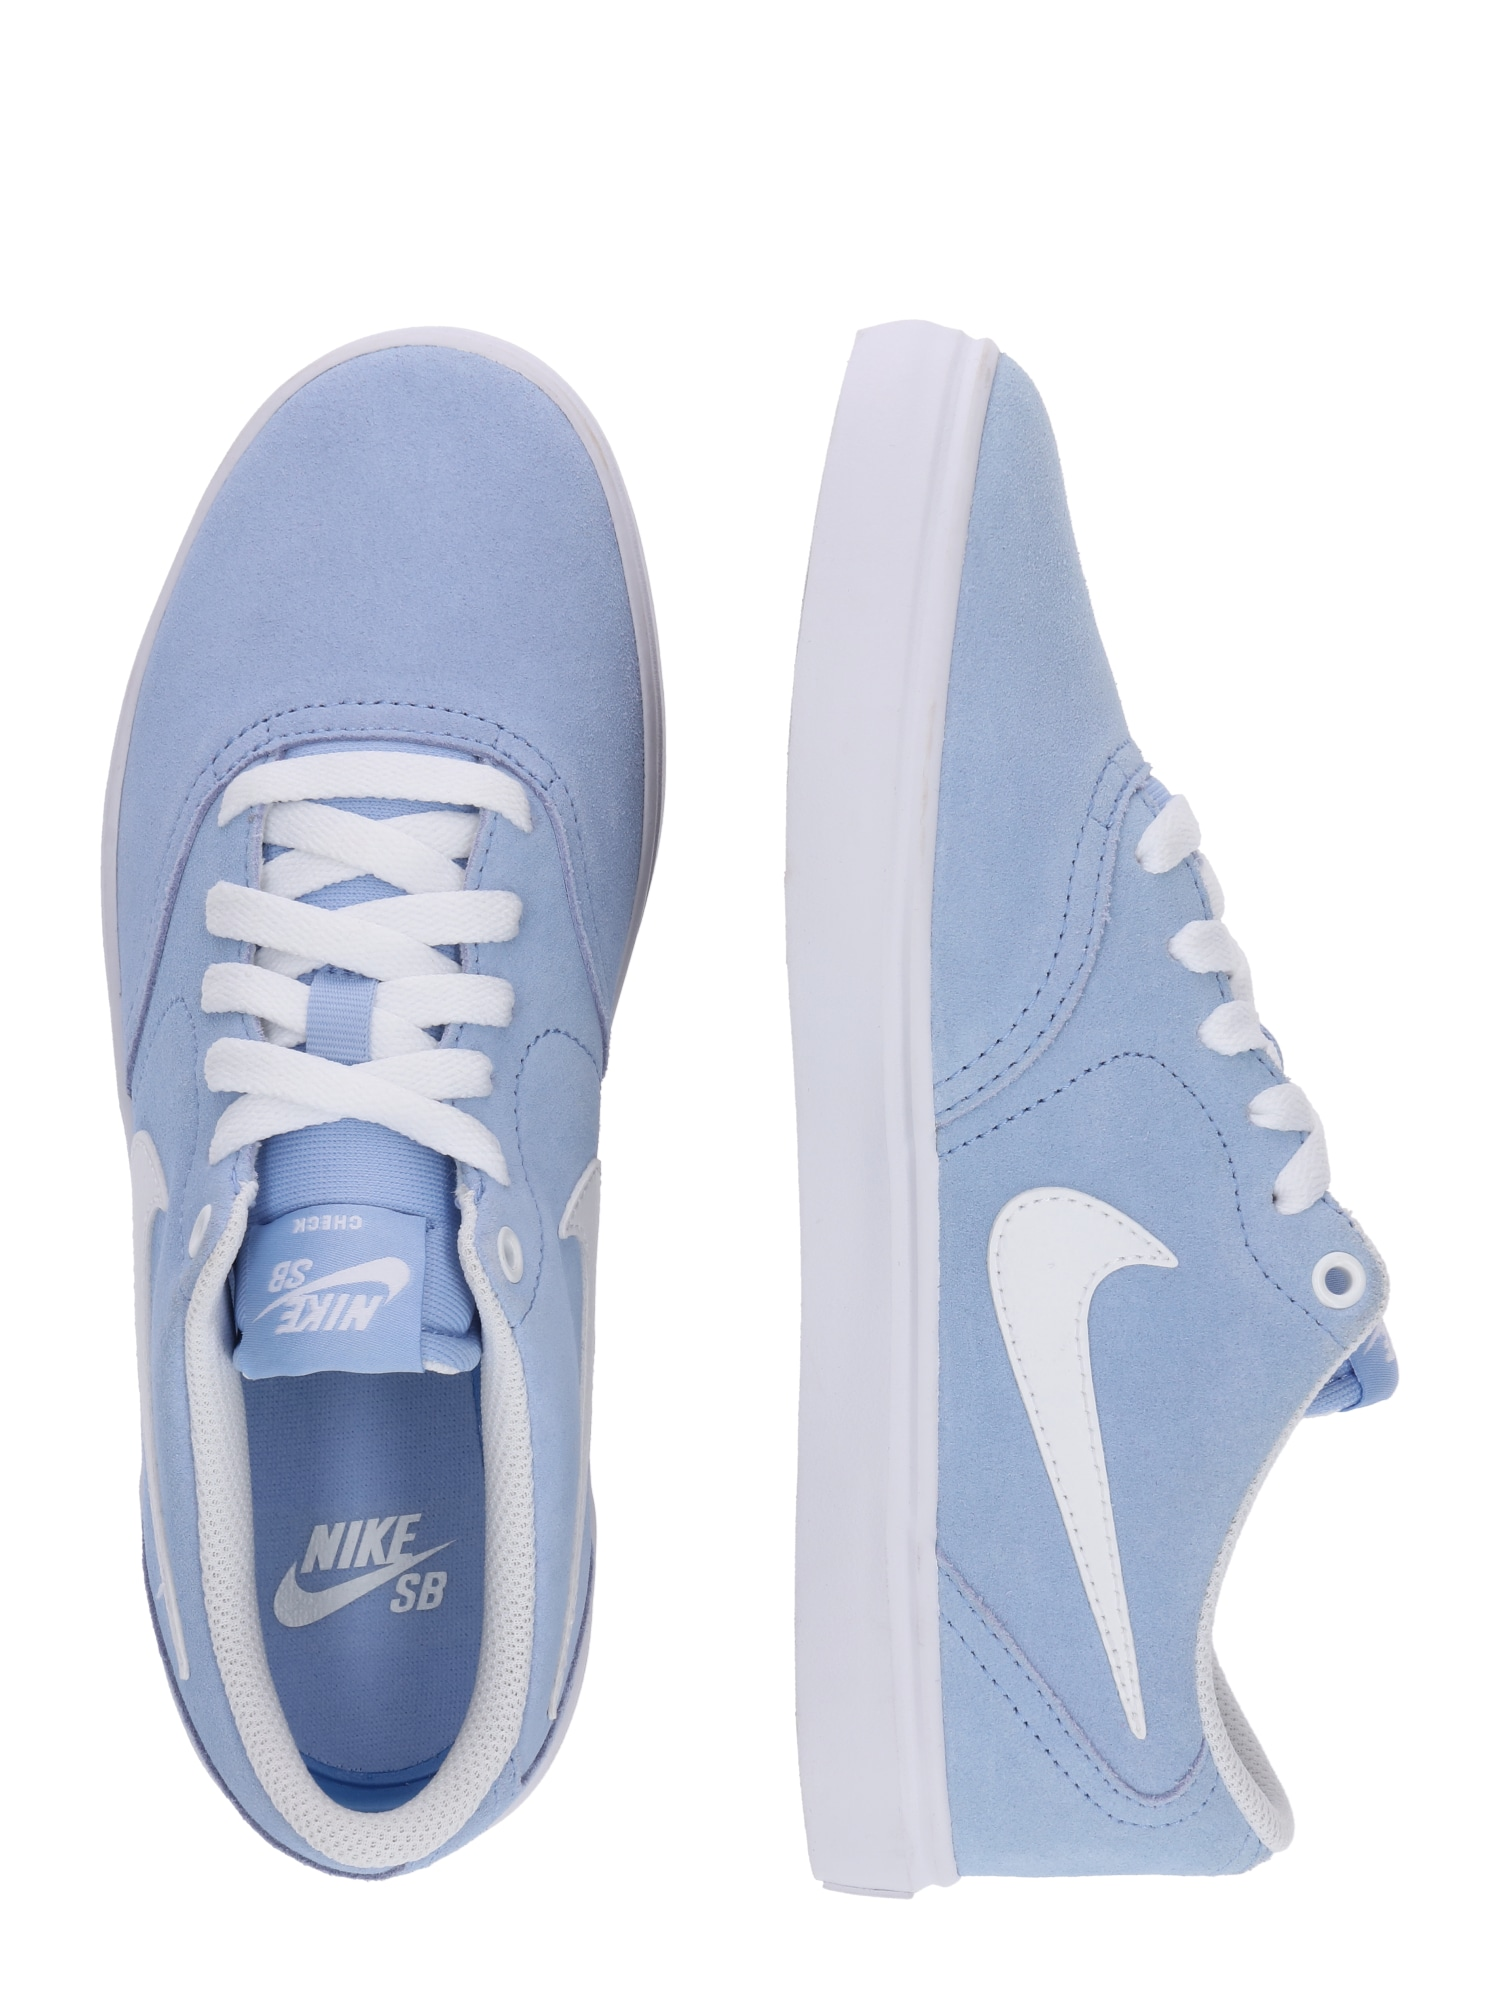 Nike SB, Damen Sneakers laag Check Solar, lichtblauw / wit